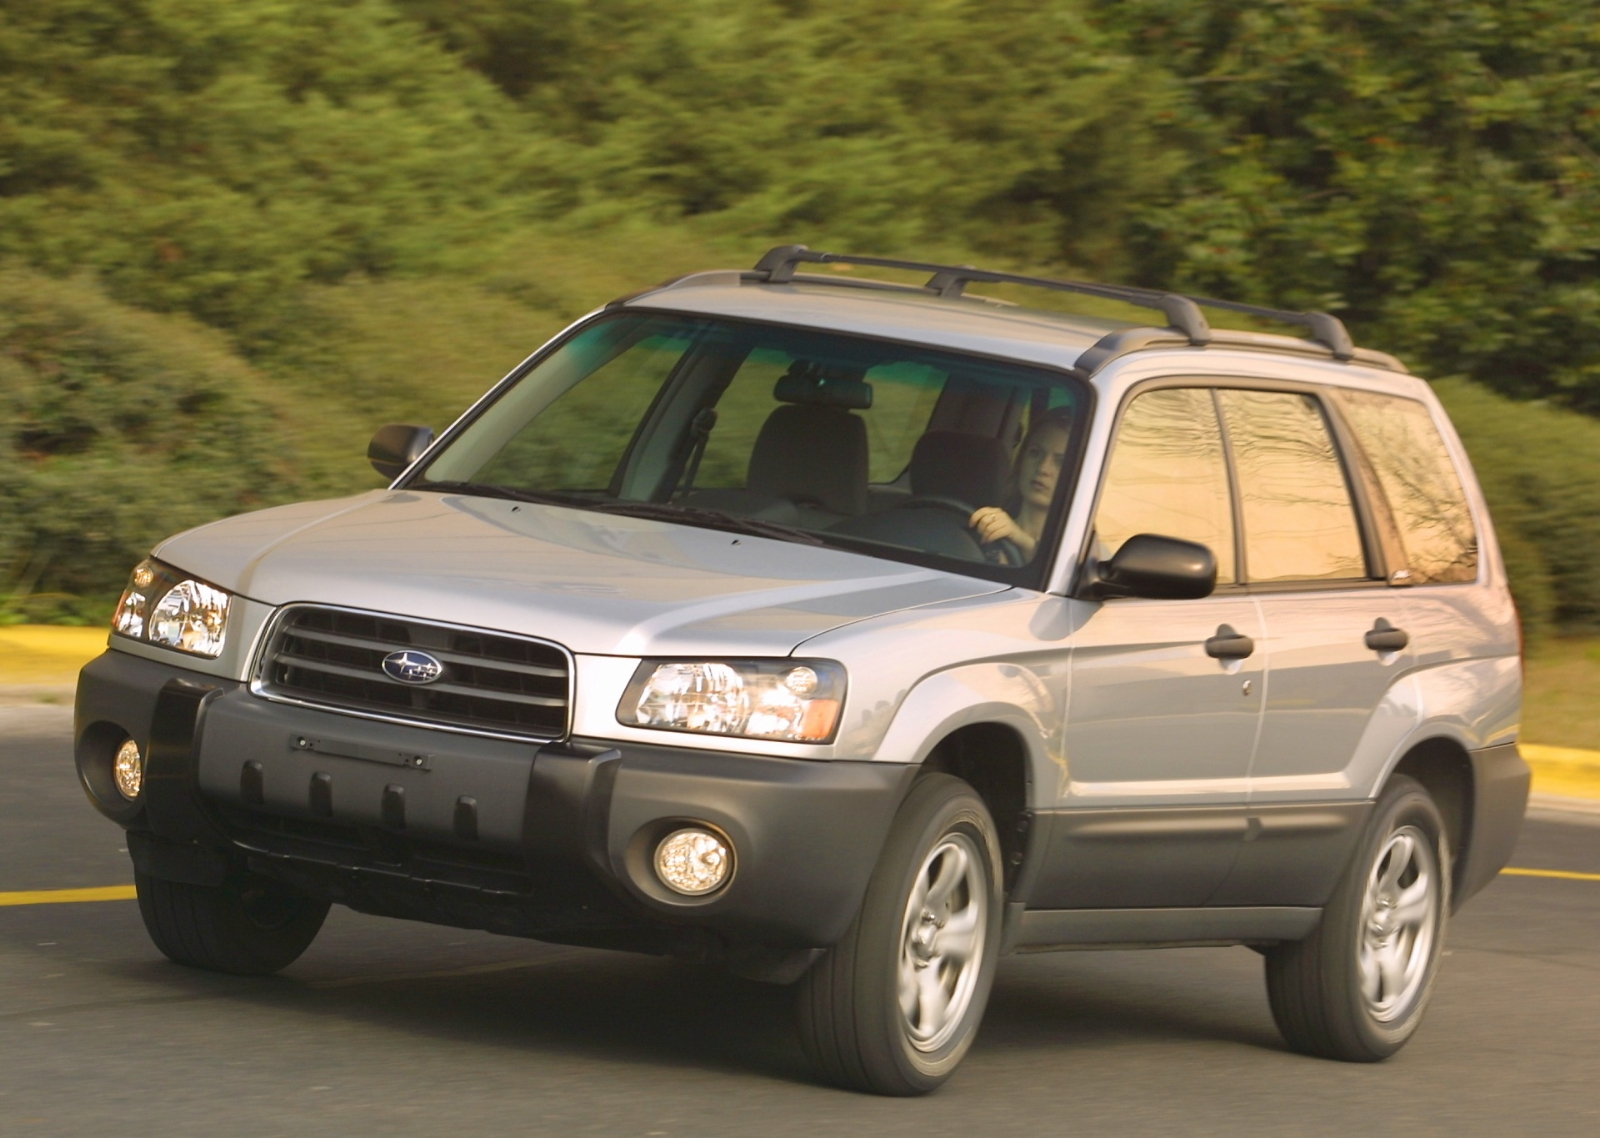 2003 Subaru Forester Image 21